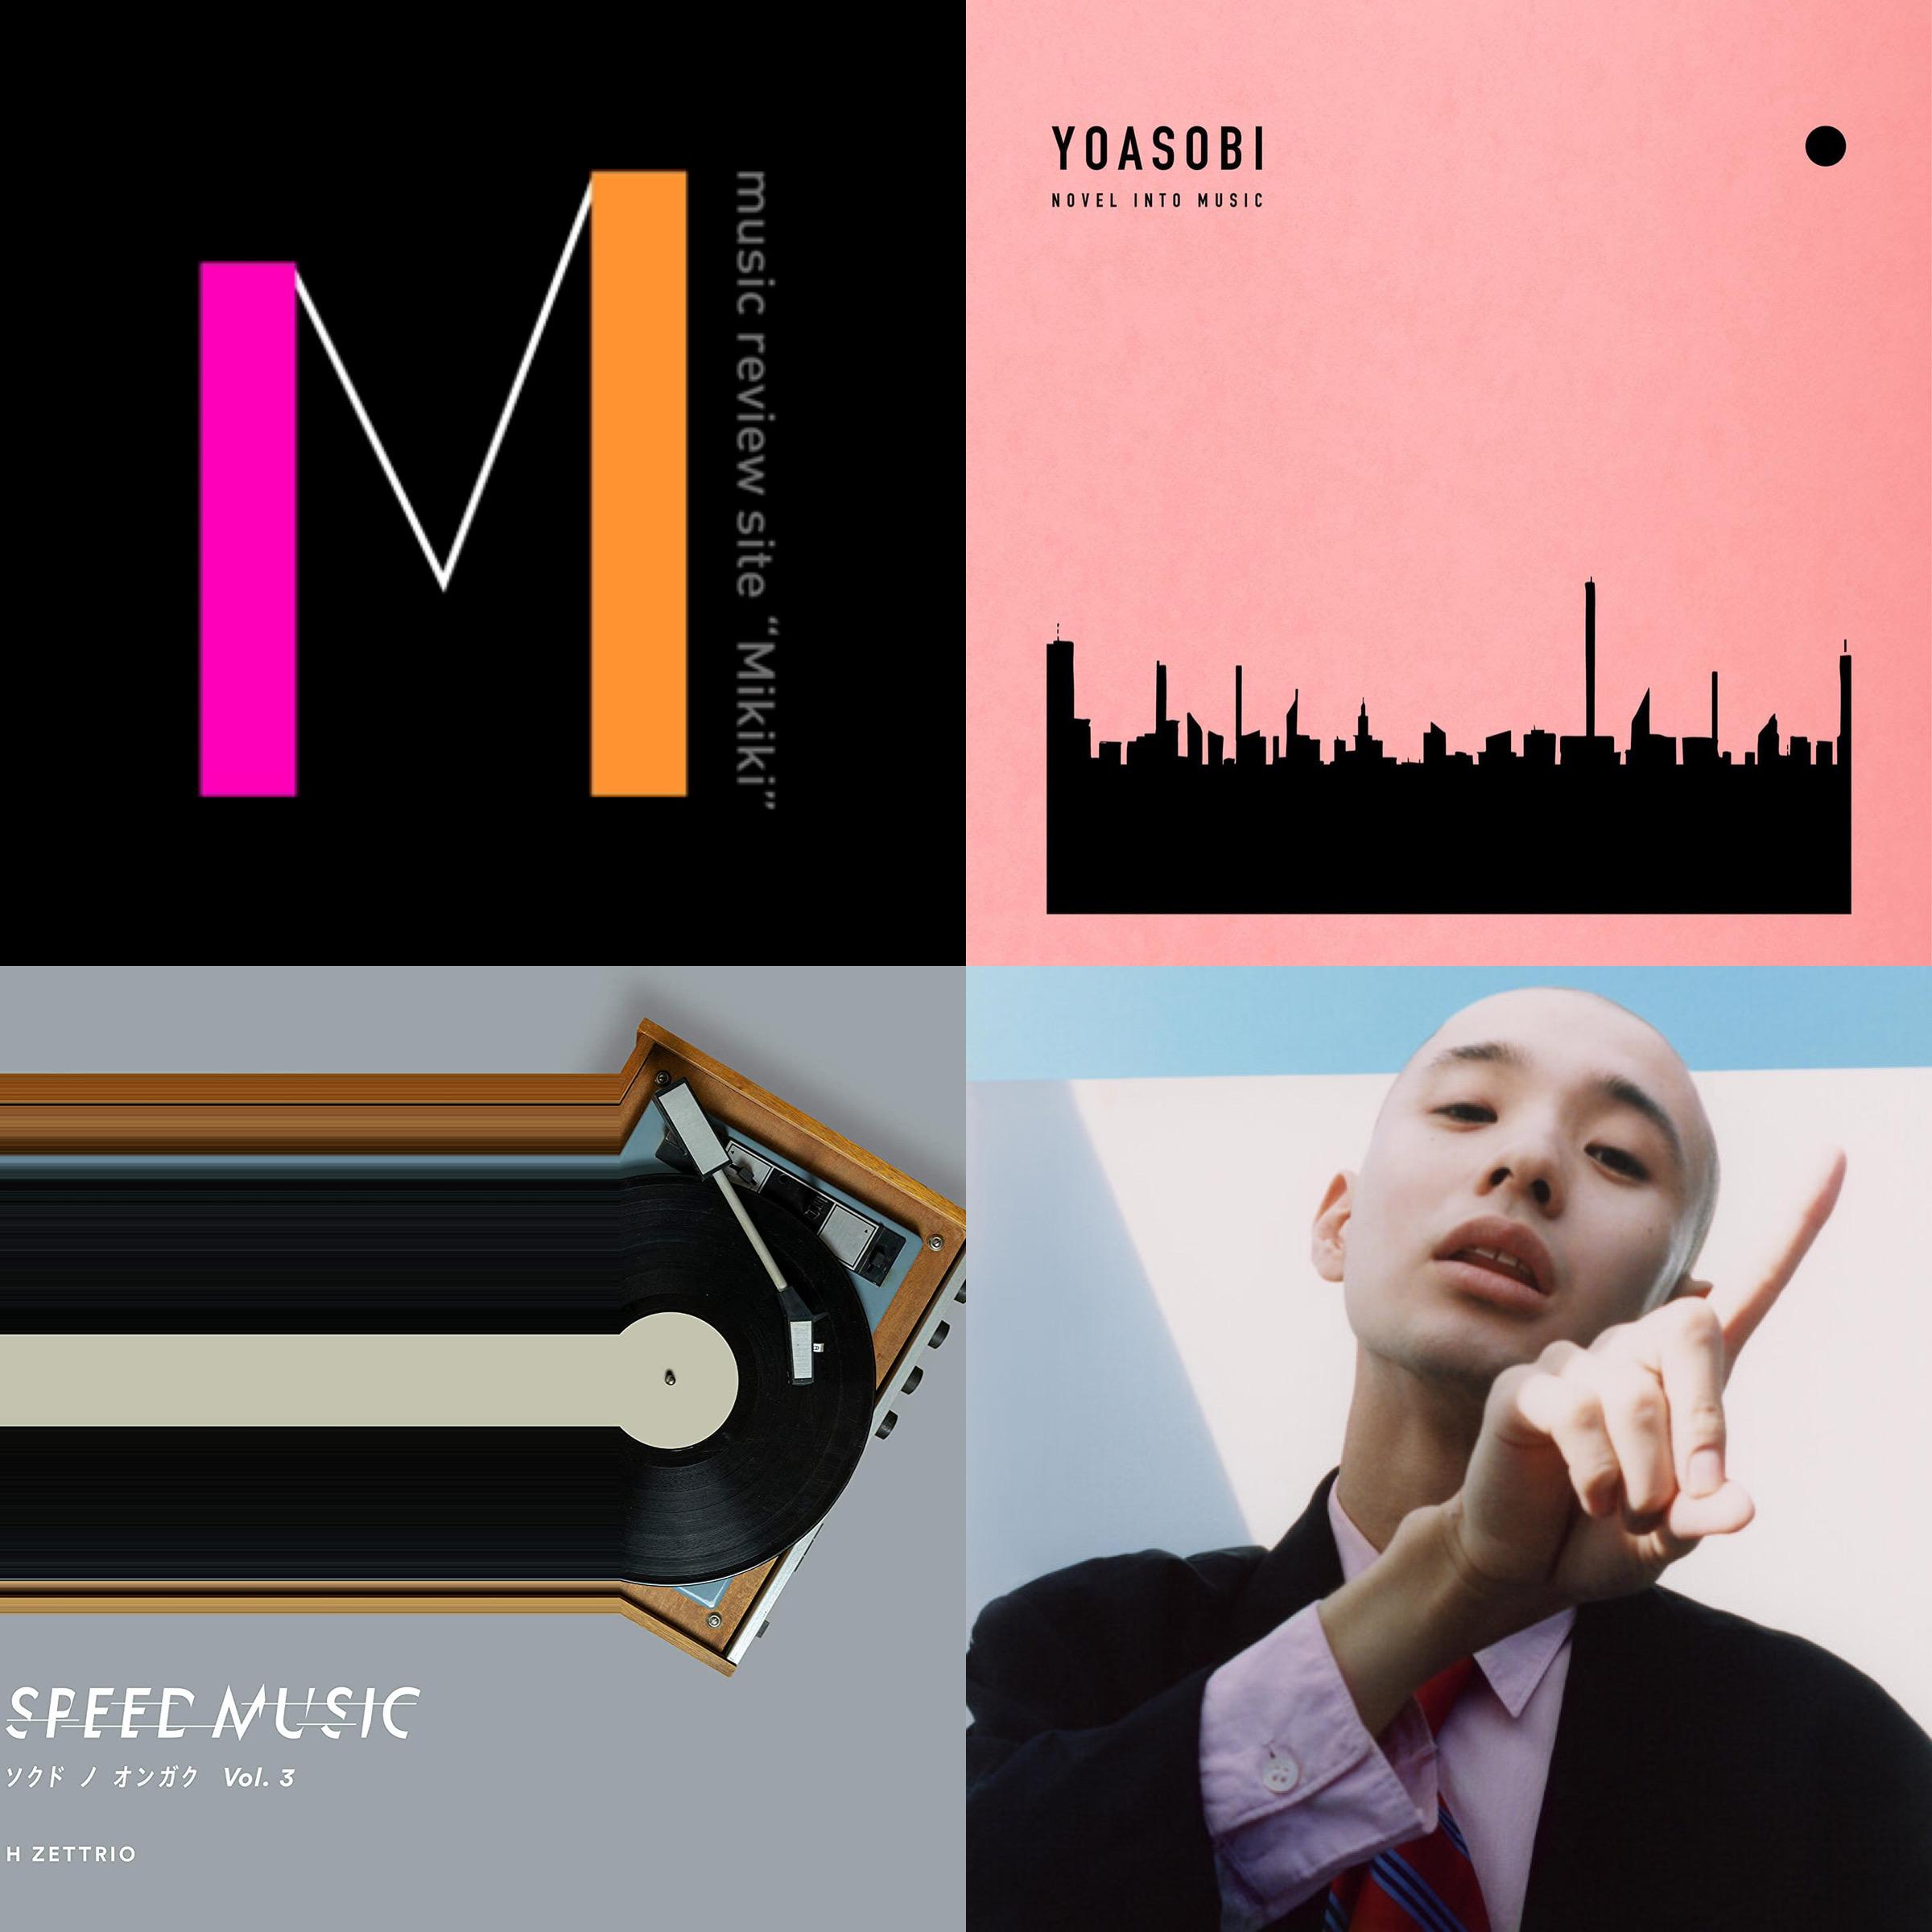 YOASOBI、H ZETTRIO、KID FRESINOなど今週リリースのMikiki推し邦楽アルバム7選!